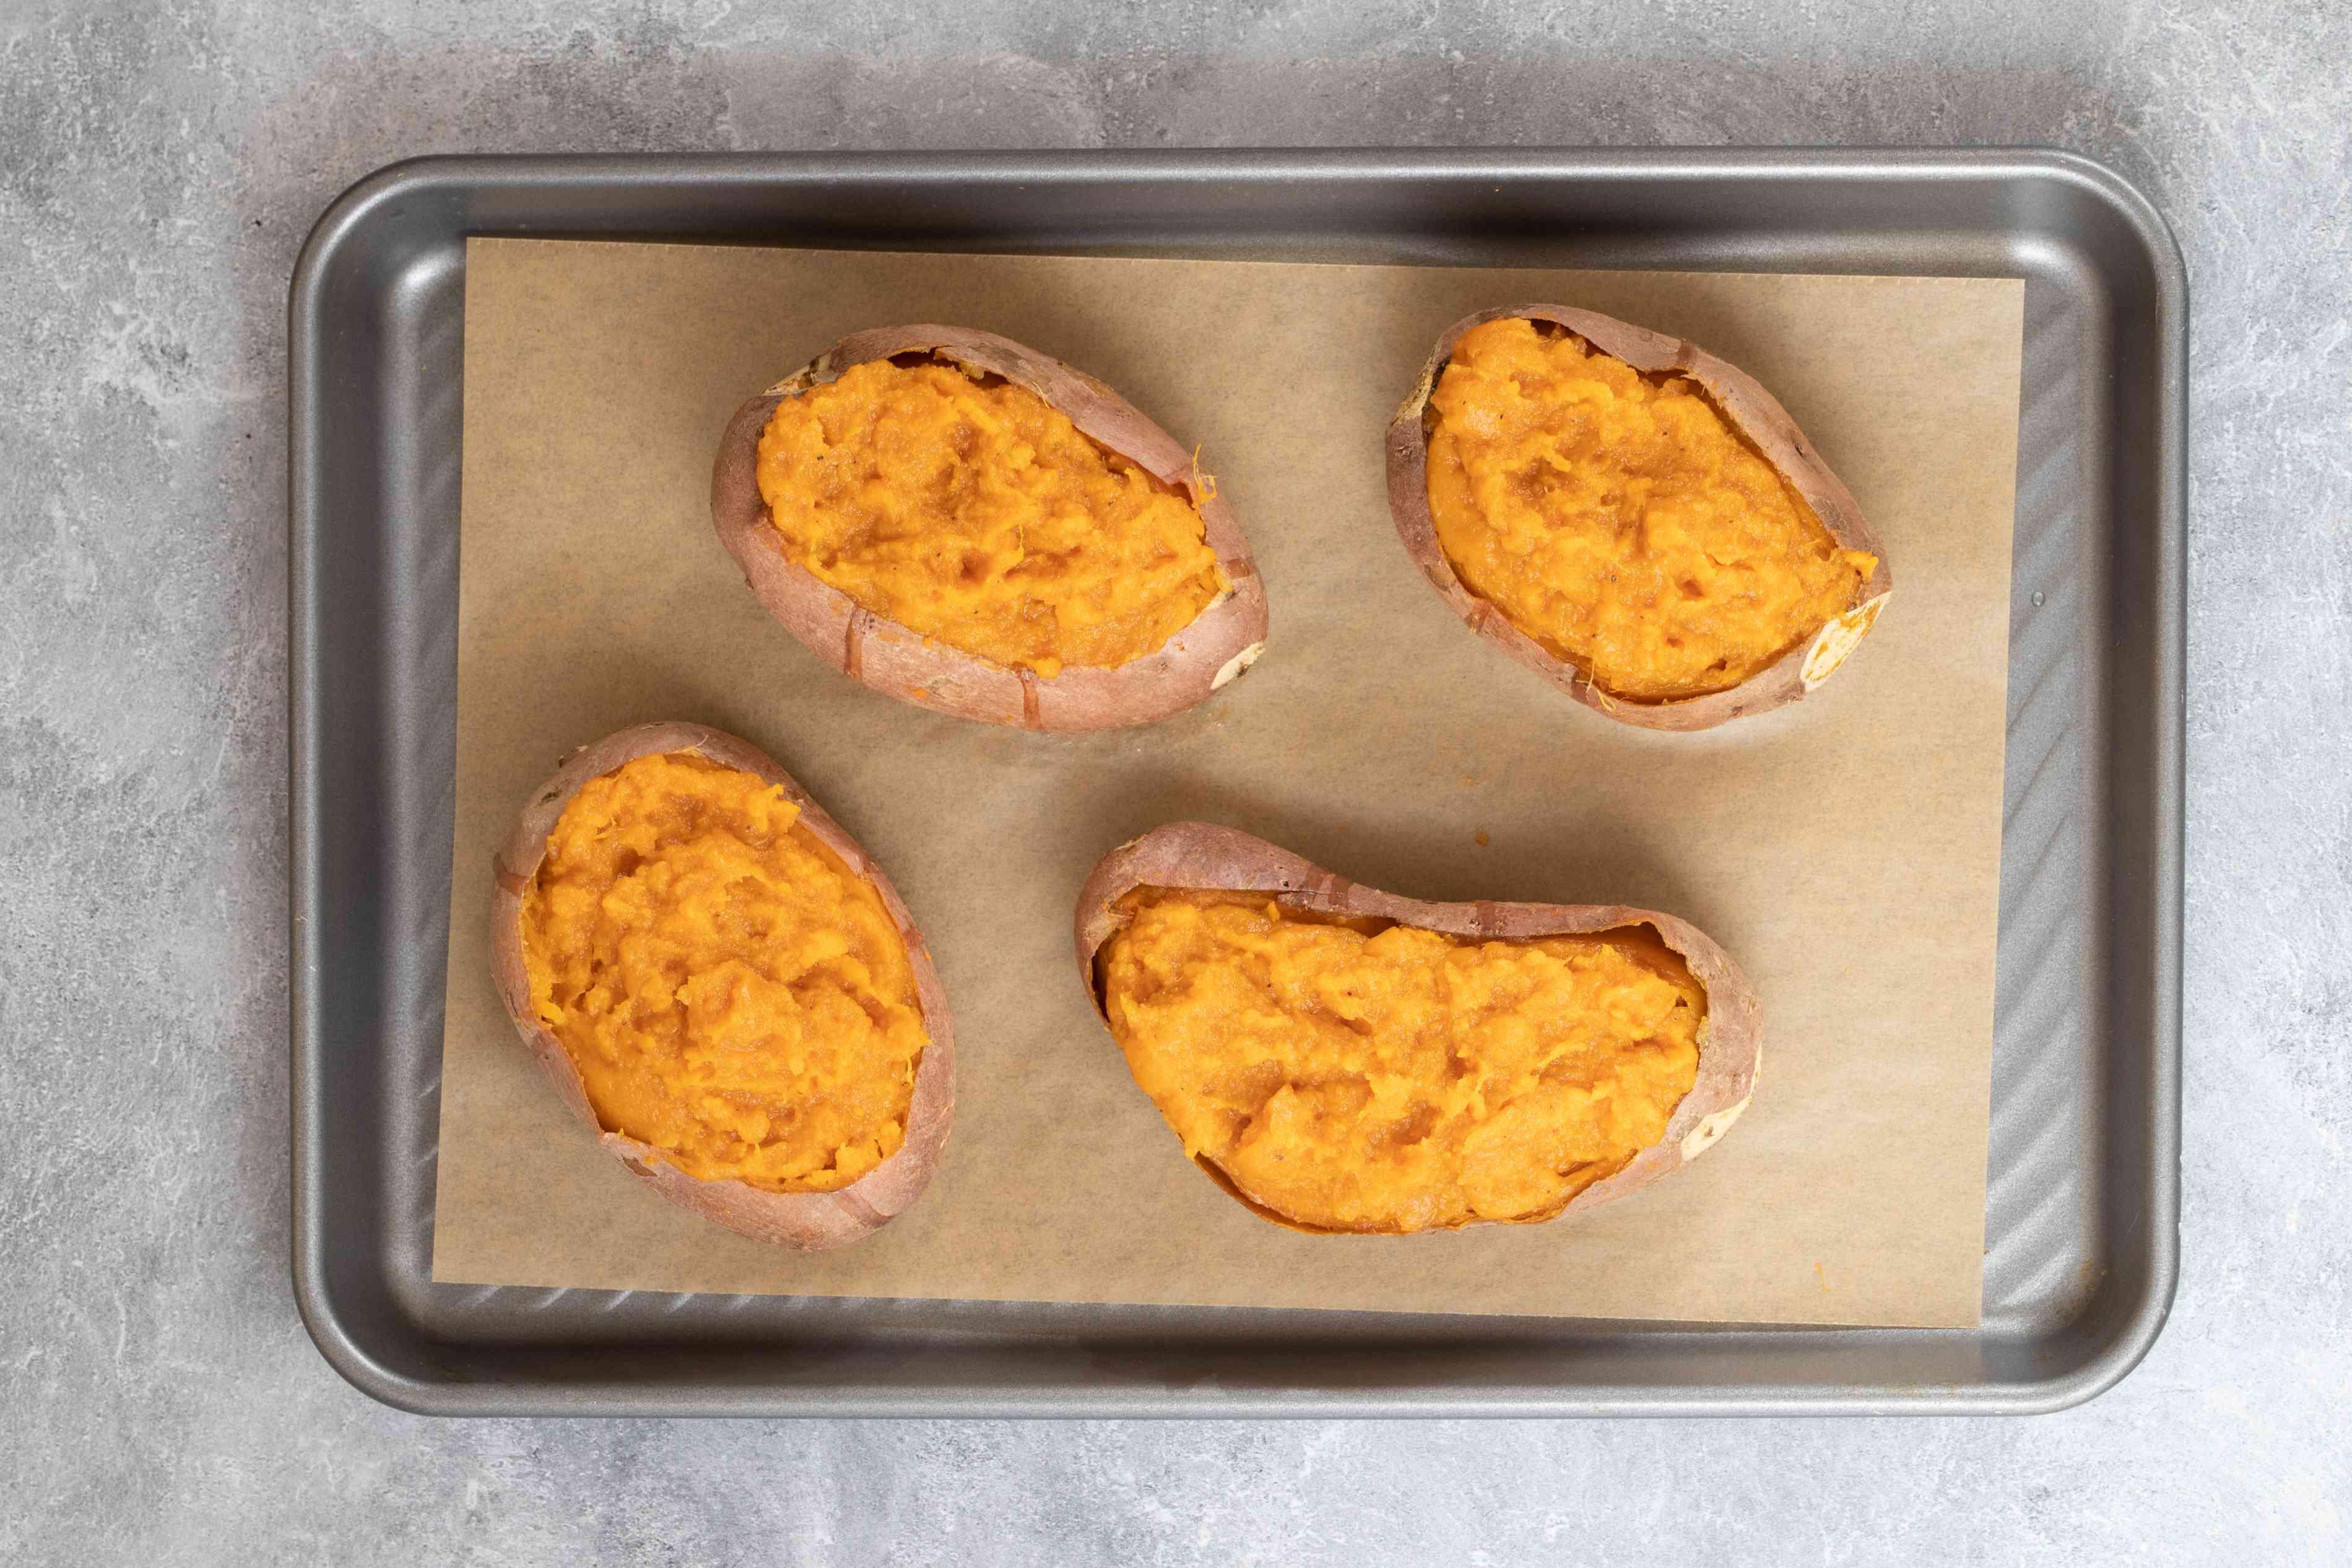 Sweet potato shells filled with mashed sweet potatoes